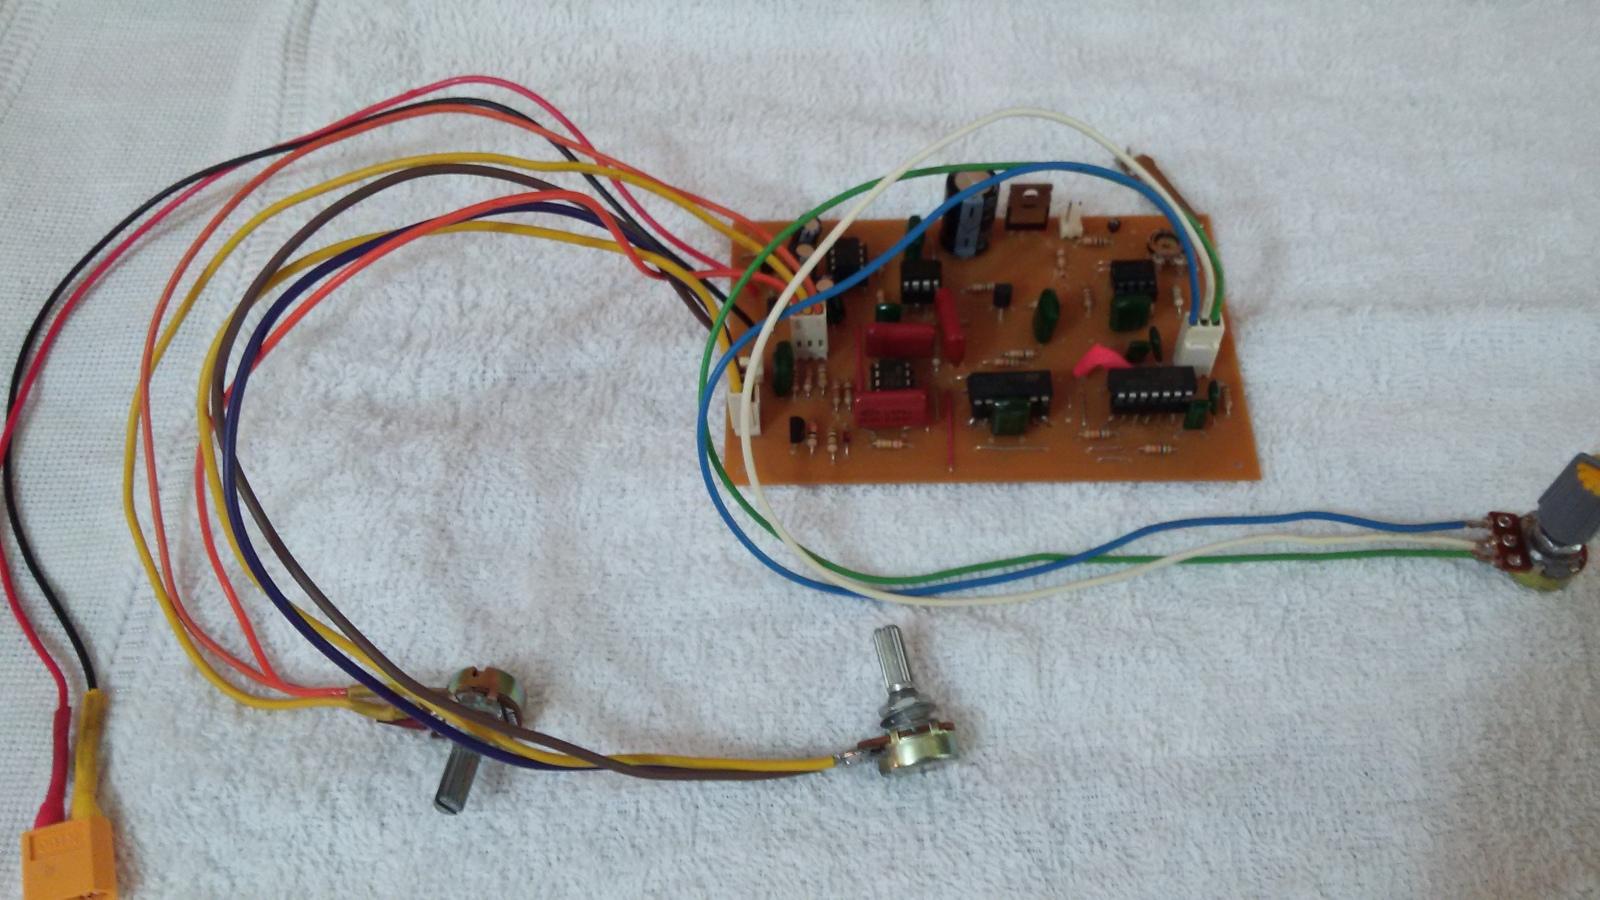 Detector Surf Pi. - Página 9 Hx0ihd